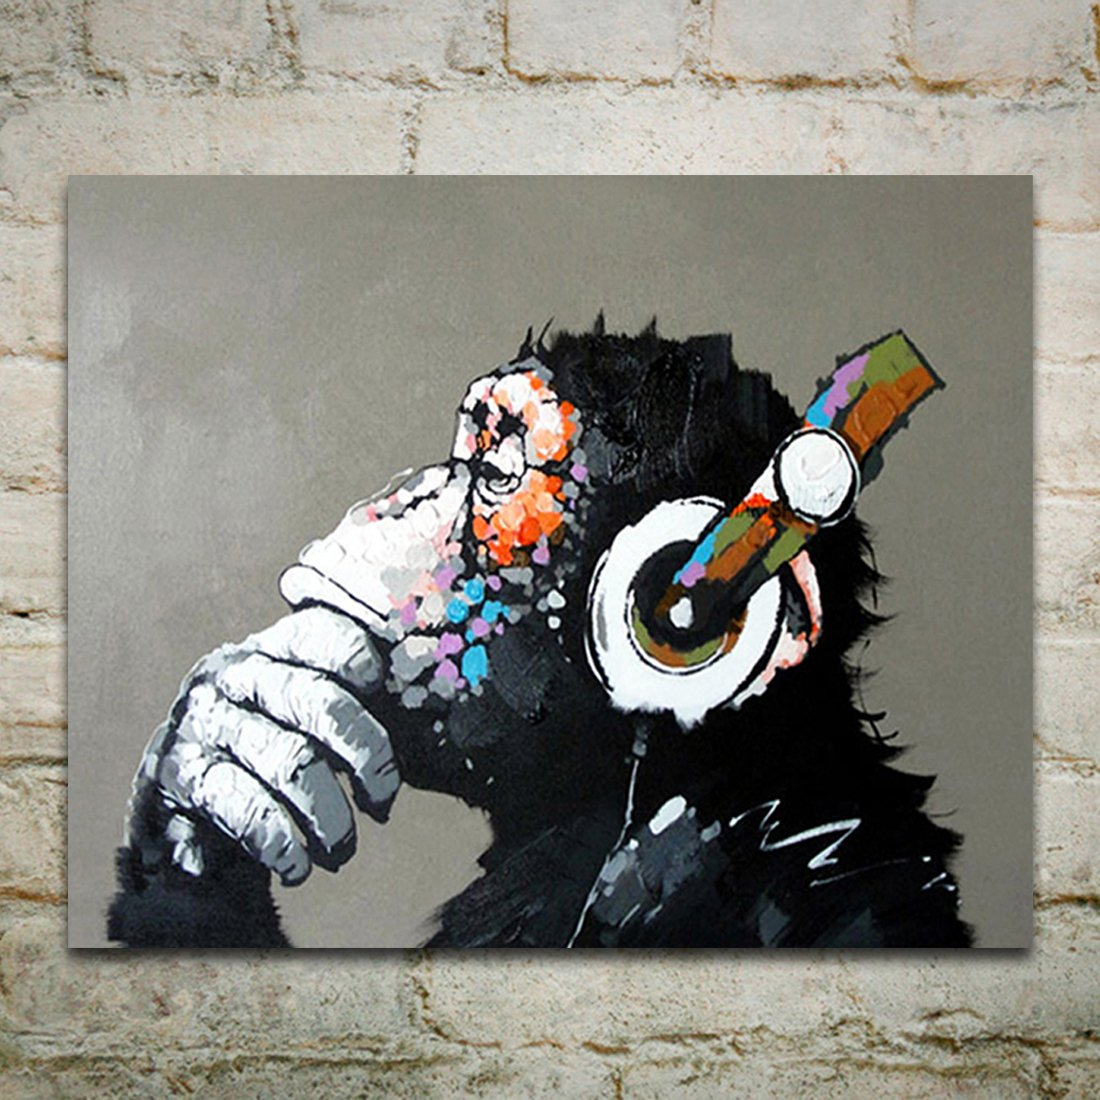 Amazoncom Muzagroo Art Oil Paintings Listen to